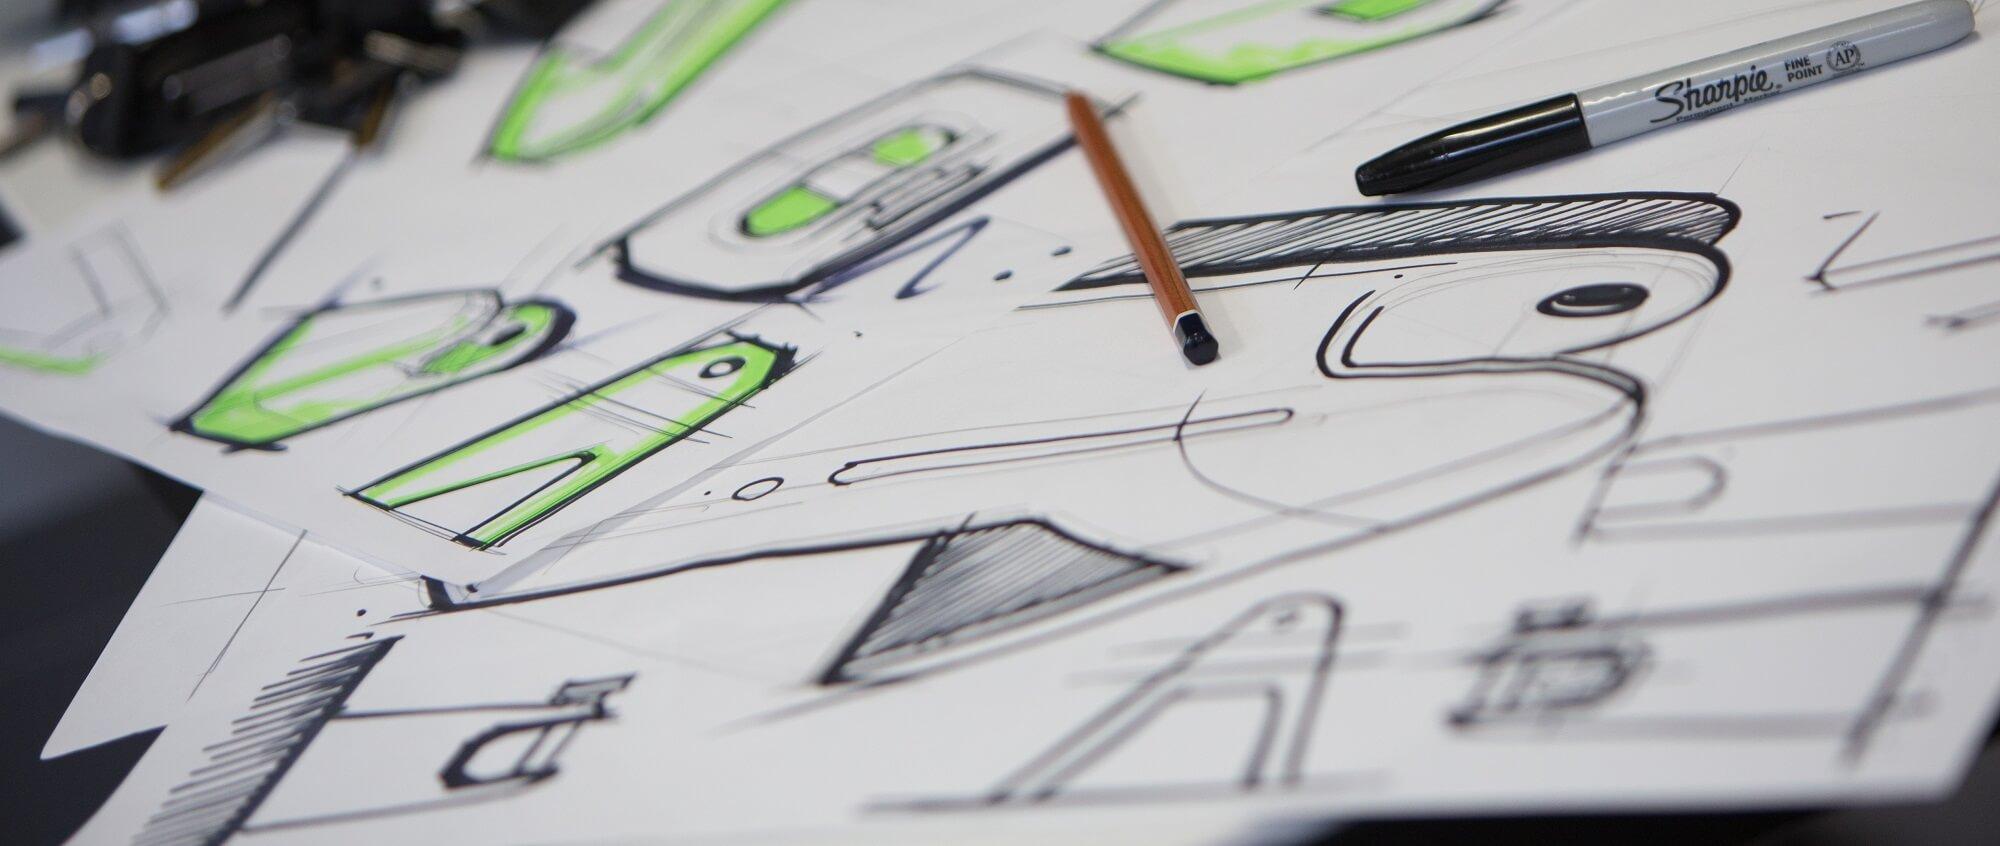 airlok-sketches